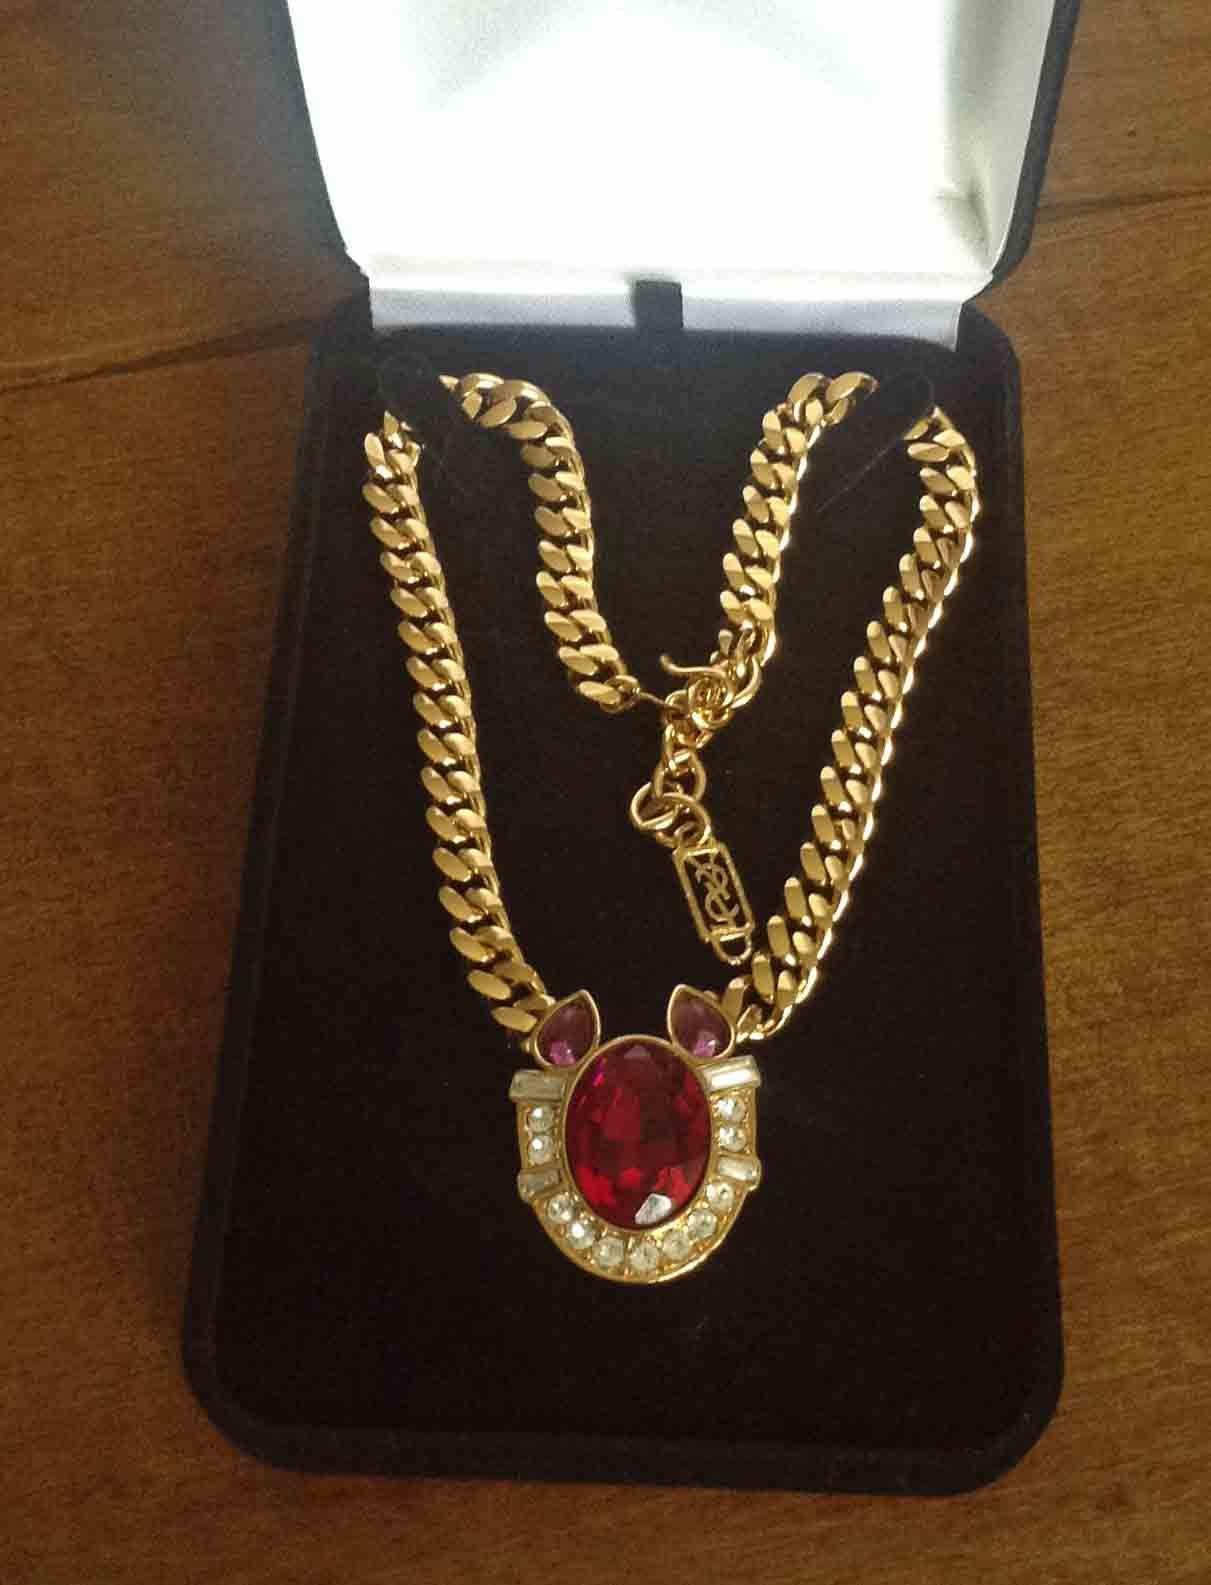 YSL Necklace in velvet box YSL faux Ruby Amethyst Rhinestones Gold